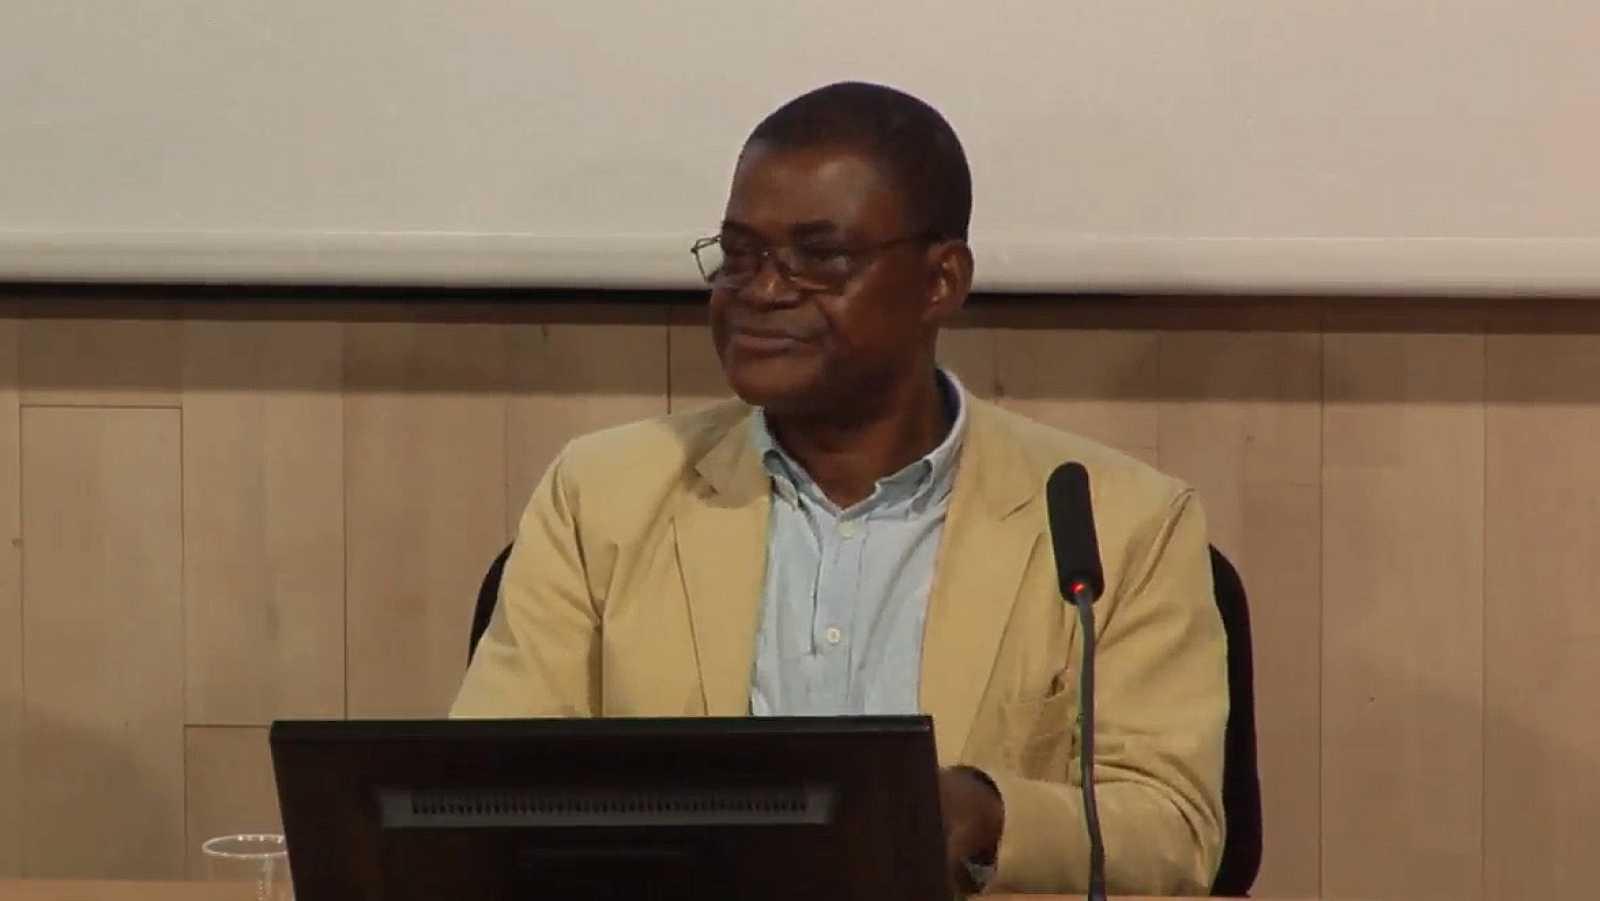 África hoy - Andrés Esono, líder del CPDS de Guinea Ecuatorial - 07/09/20 - escuchar ahora